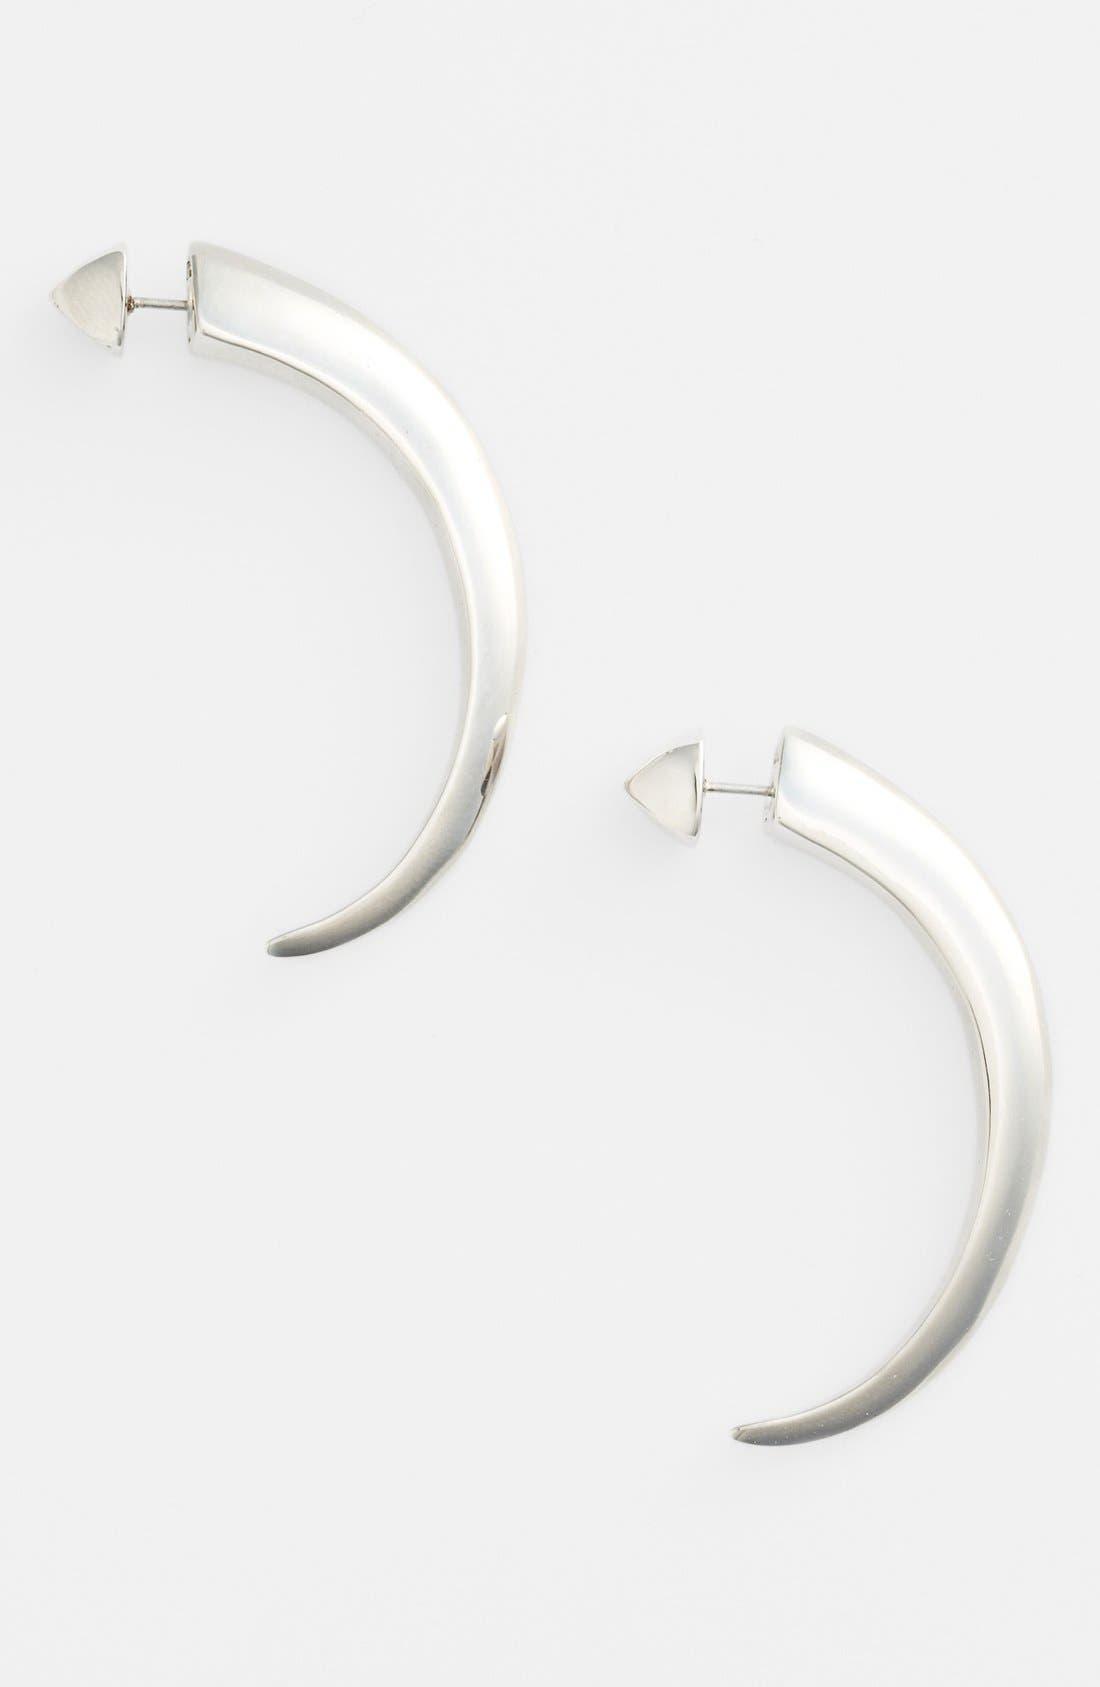 Alternate Image 1 Selected - Vince Camuto 'By the Horns' Reversible Large Hoop Earrings